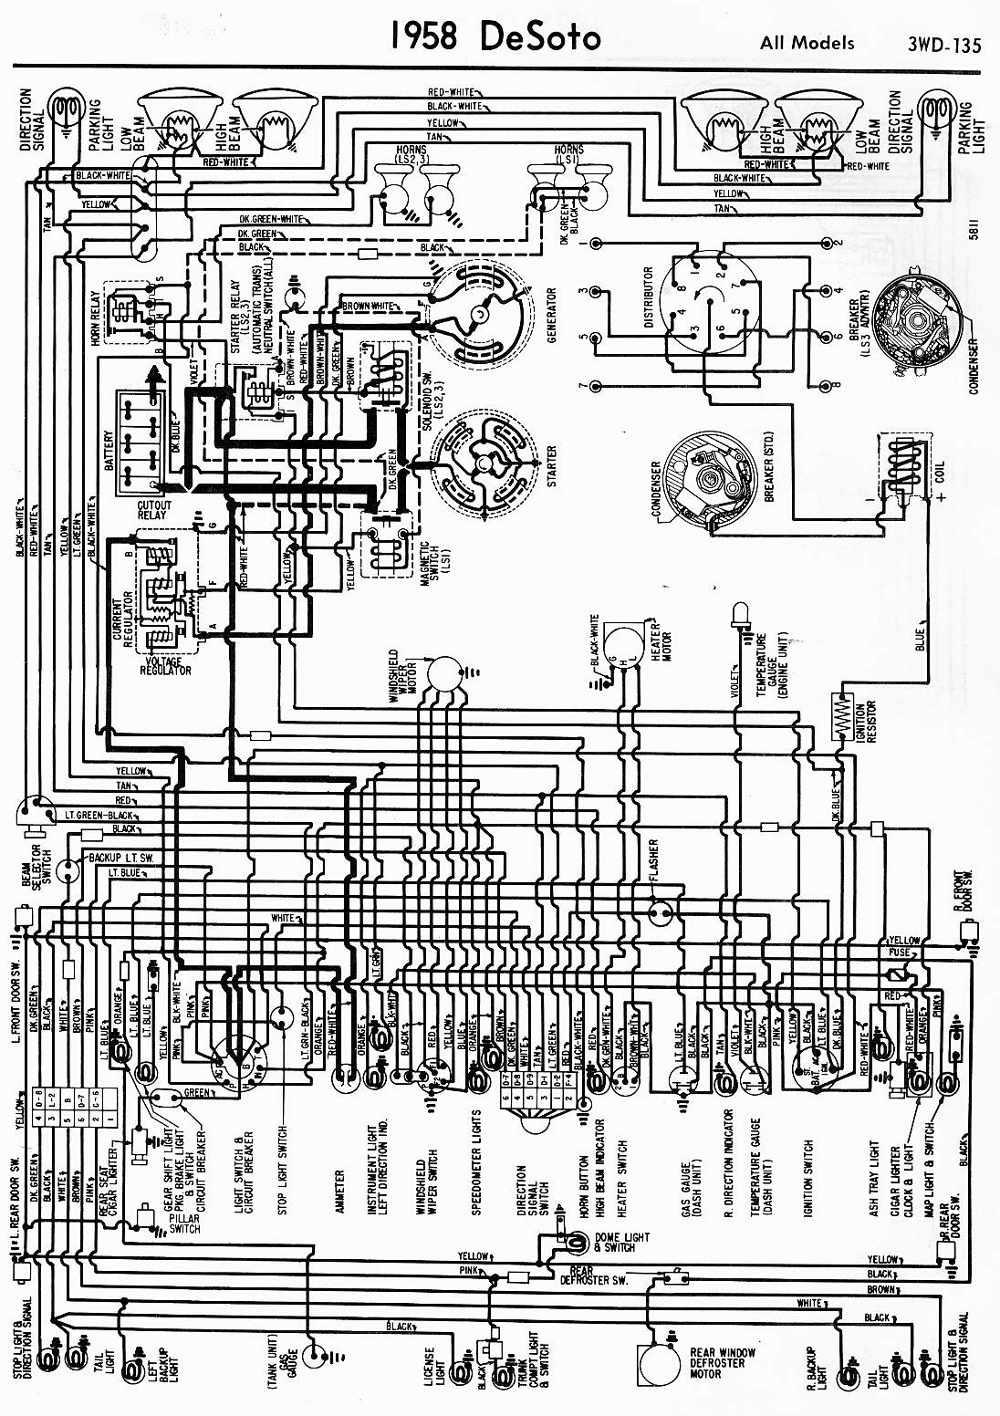 hight resolution of 1960 desoto wiring diagram enthusiast wiring diagrams u2022 rh rasalibre co 1960 chrysler 1960 dodge